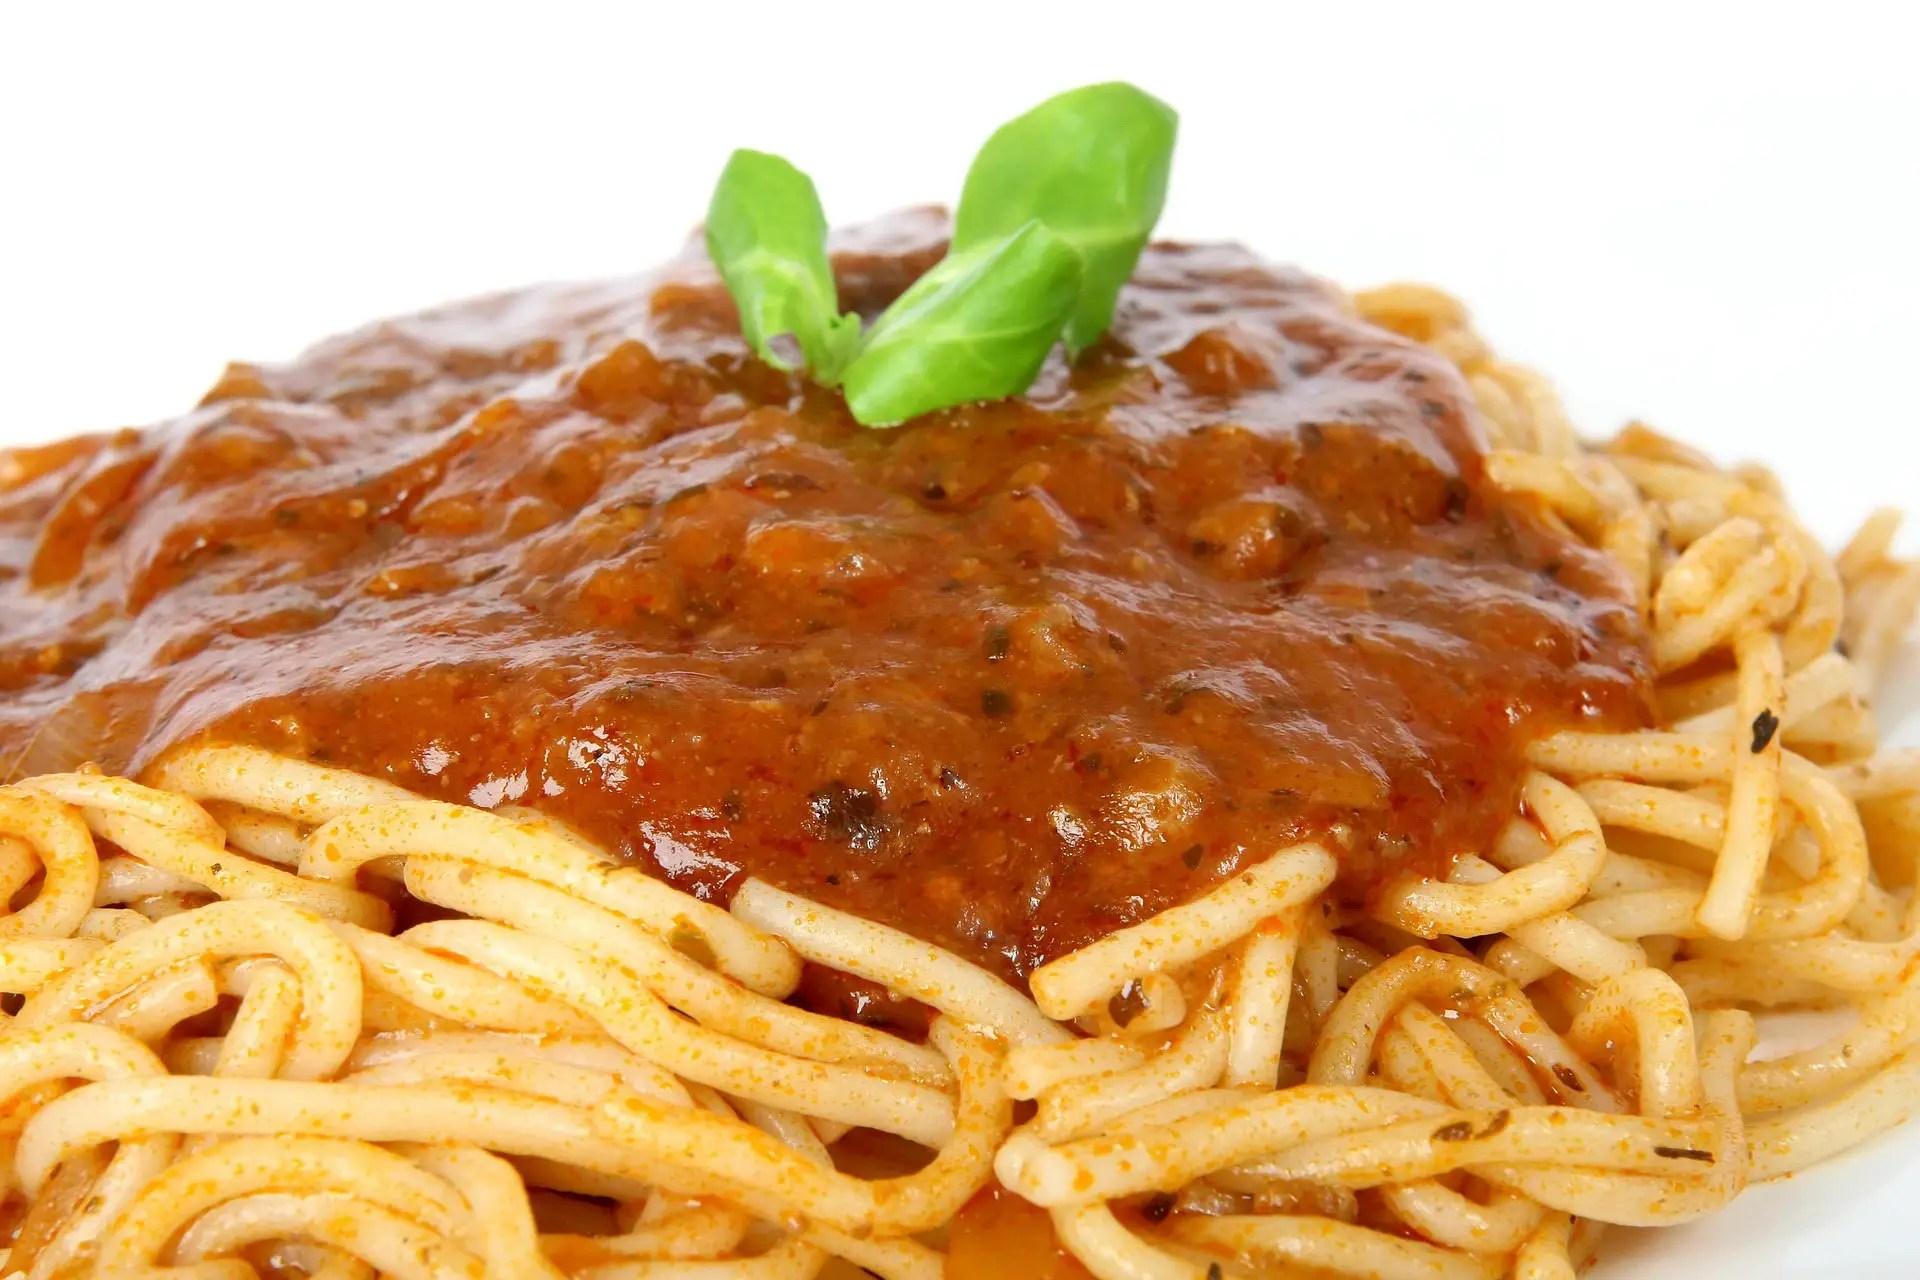 Spaghetti mit Tomatensoße und Brokkoli-Gratin